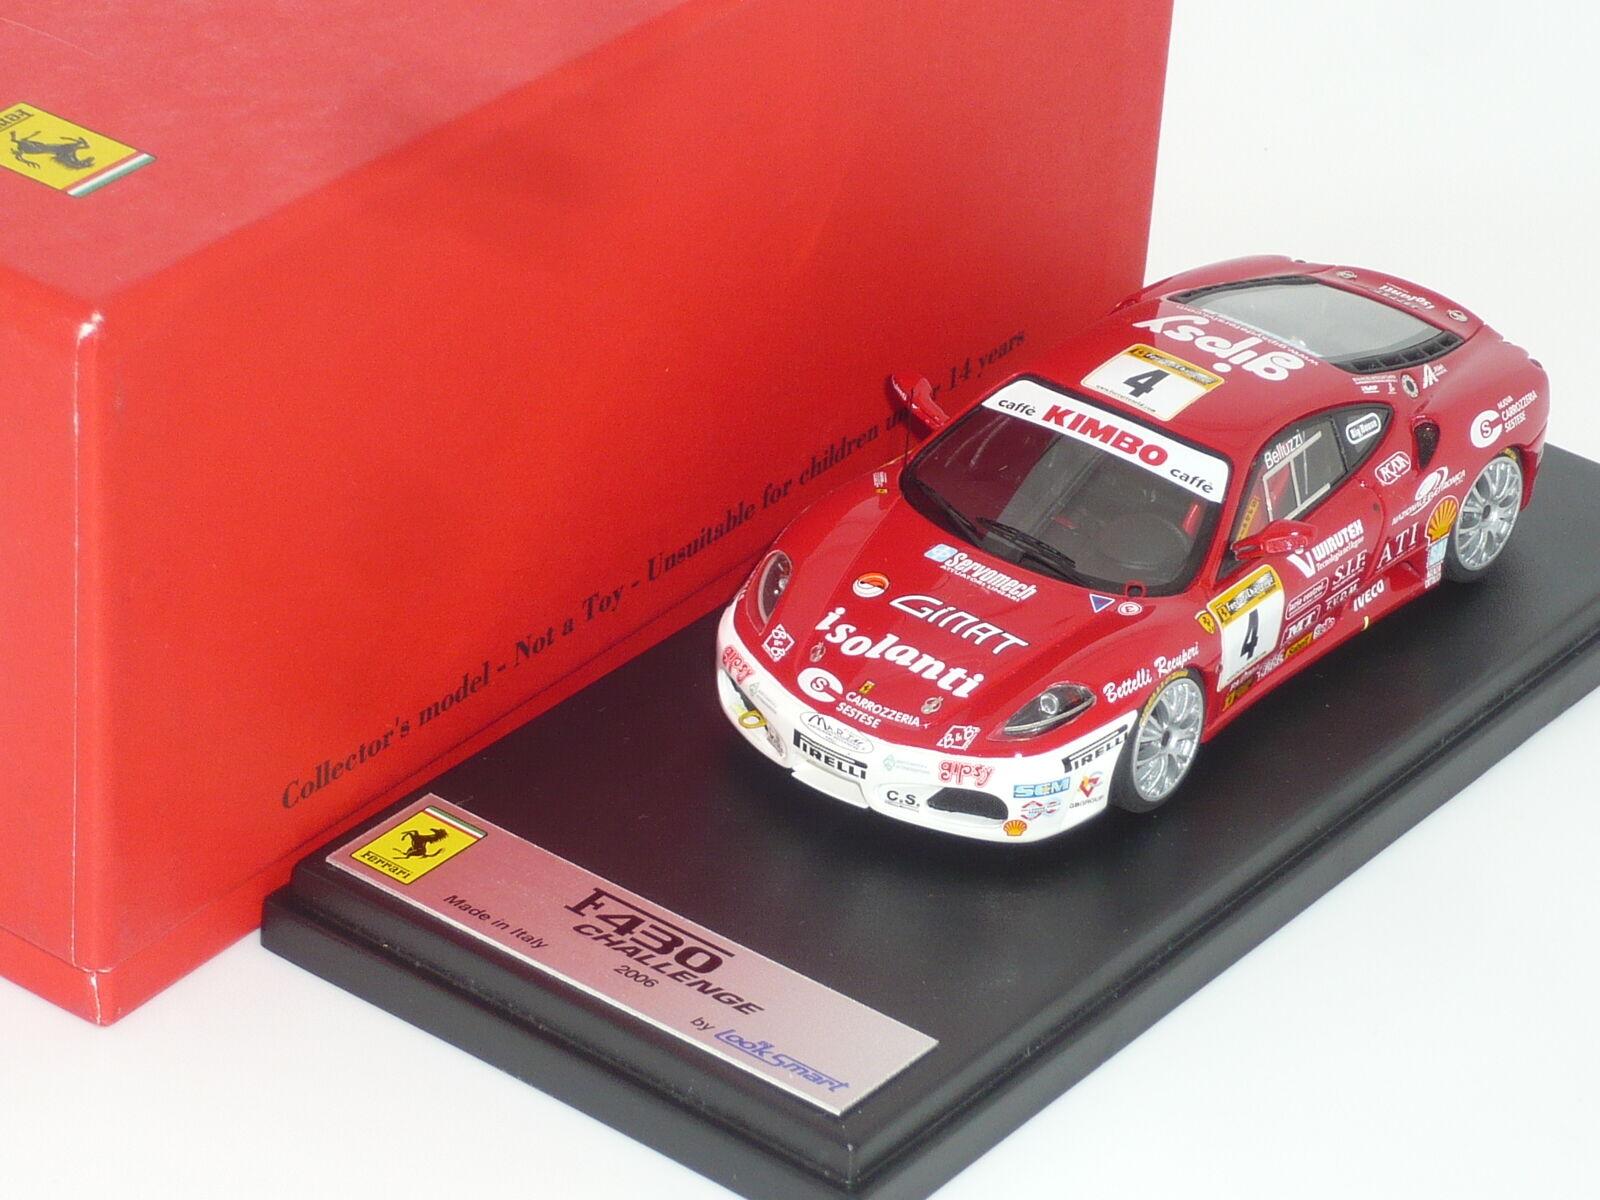 venta con alto descuento Nuevo Nuevo Nuevo 1 43 LookSmart Resina HANDBUILT Ferrari F430 Challenge V8 Race Coche n Le Mans  oferta de tienda